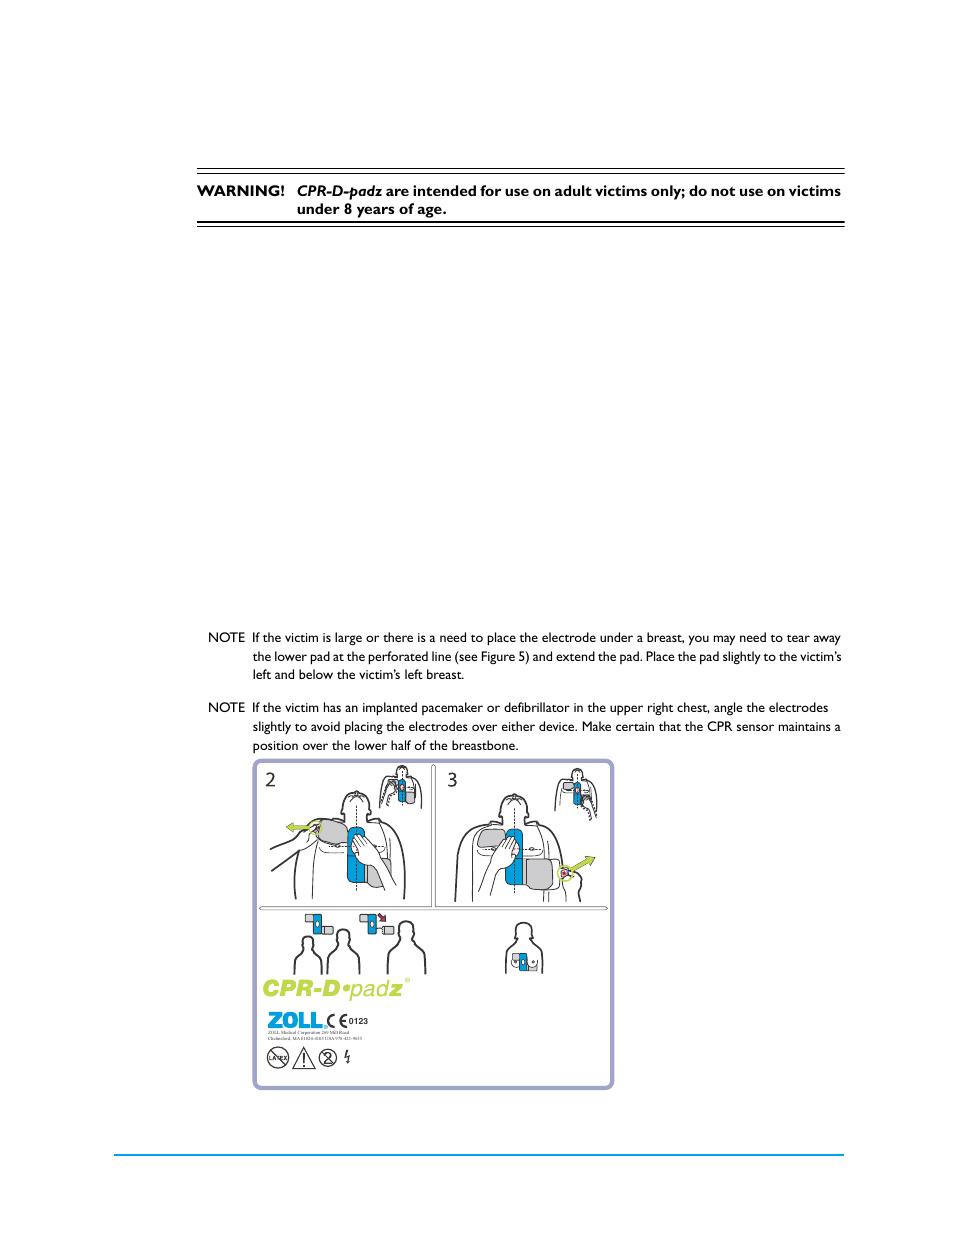 Applying cpr-d- pad z | ZOLL AED Plus Rev V User Manual